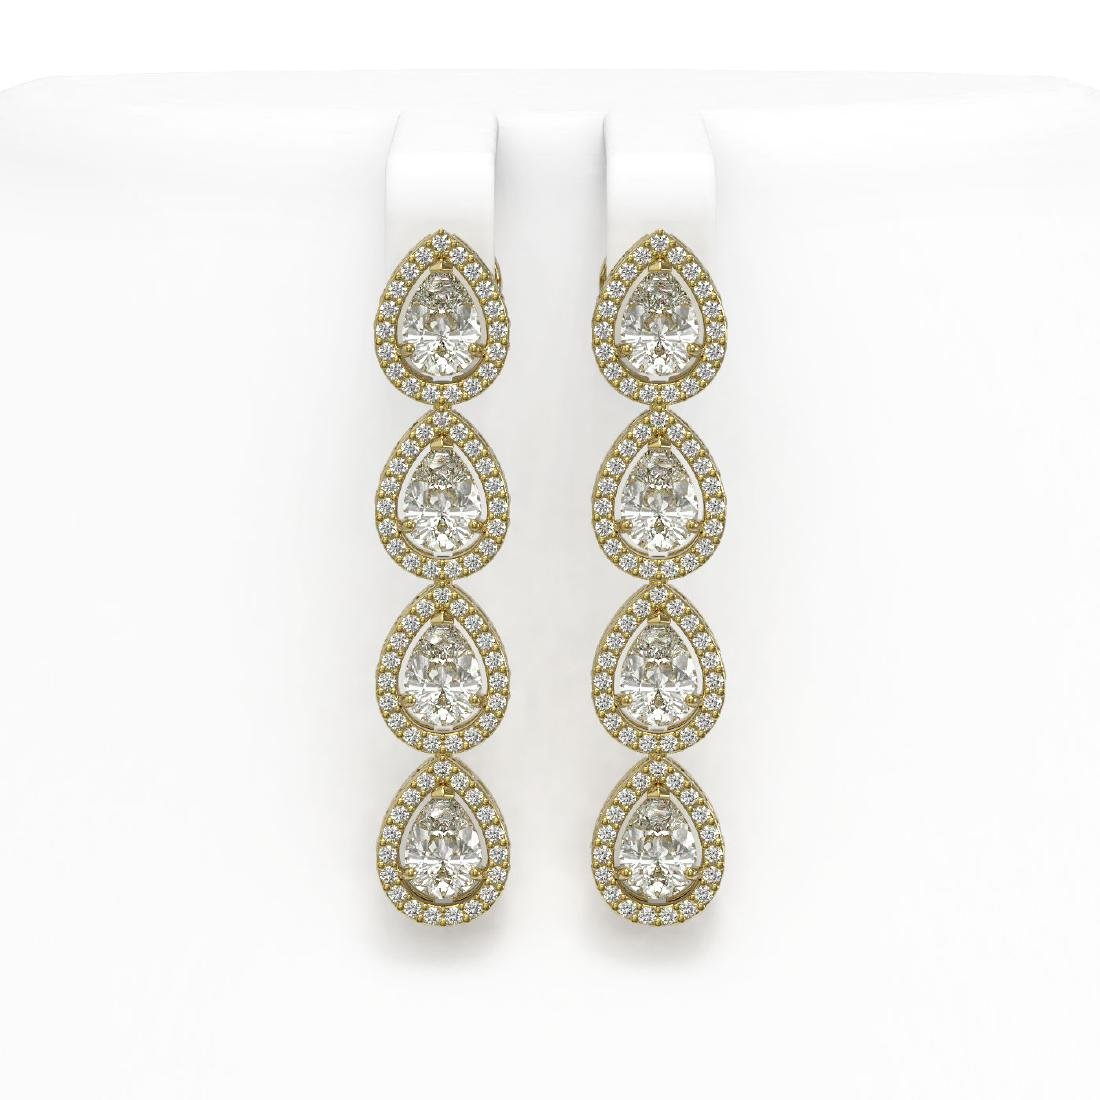 6.01 CTW Pear Diamond Designer Earrings 18K Yellow Gold